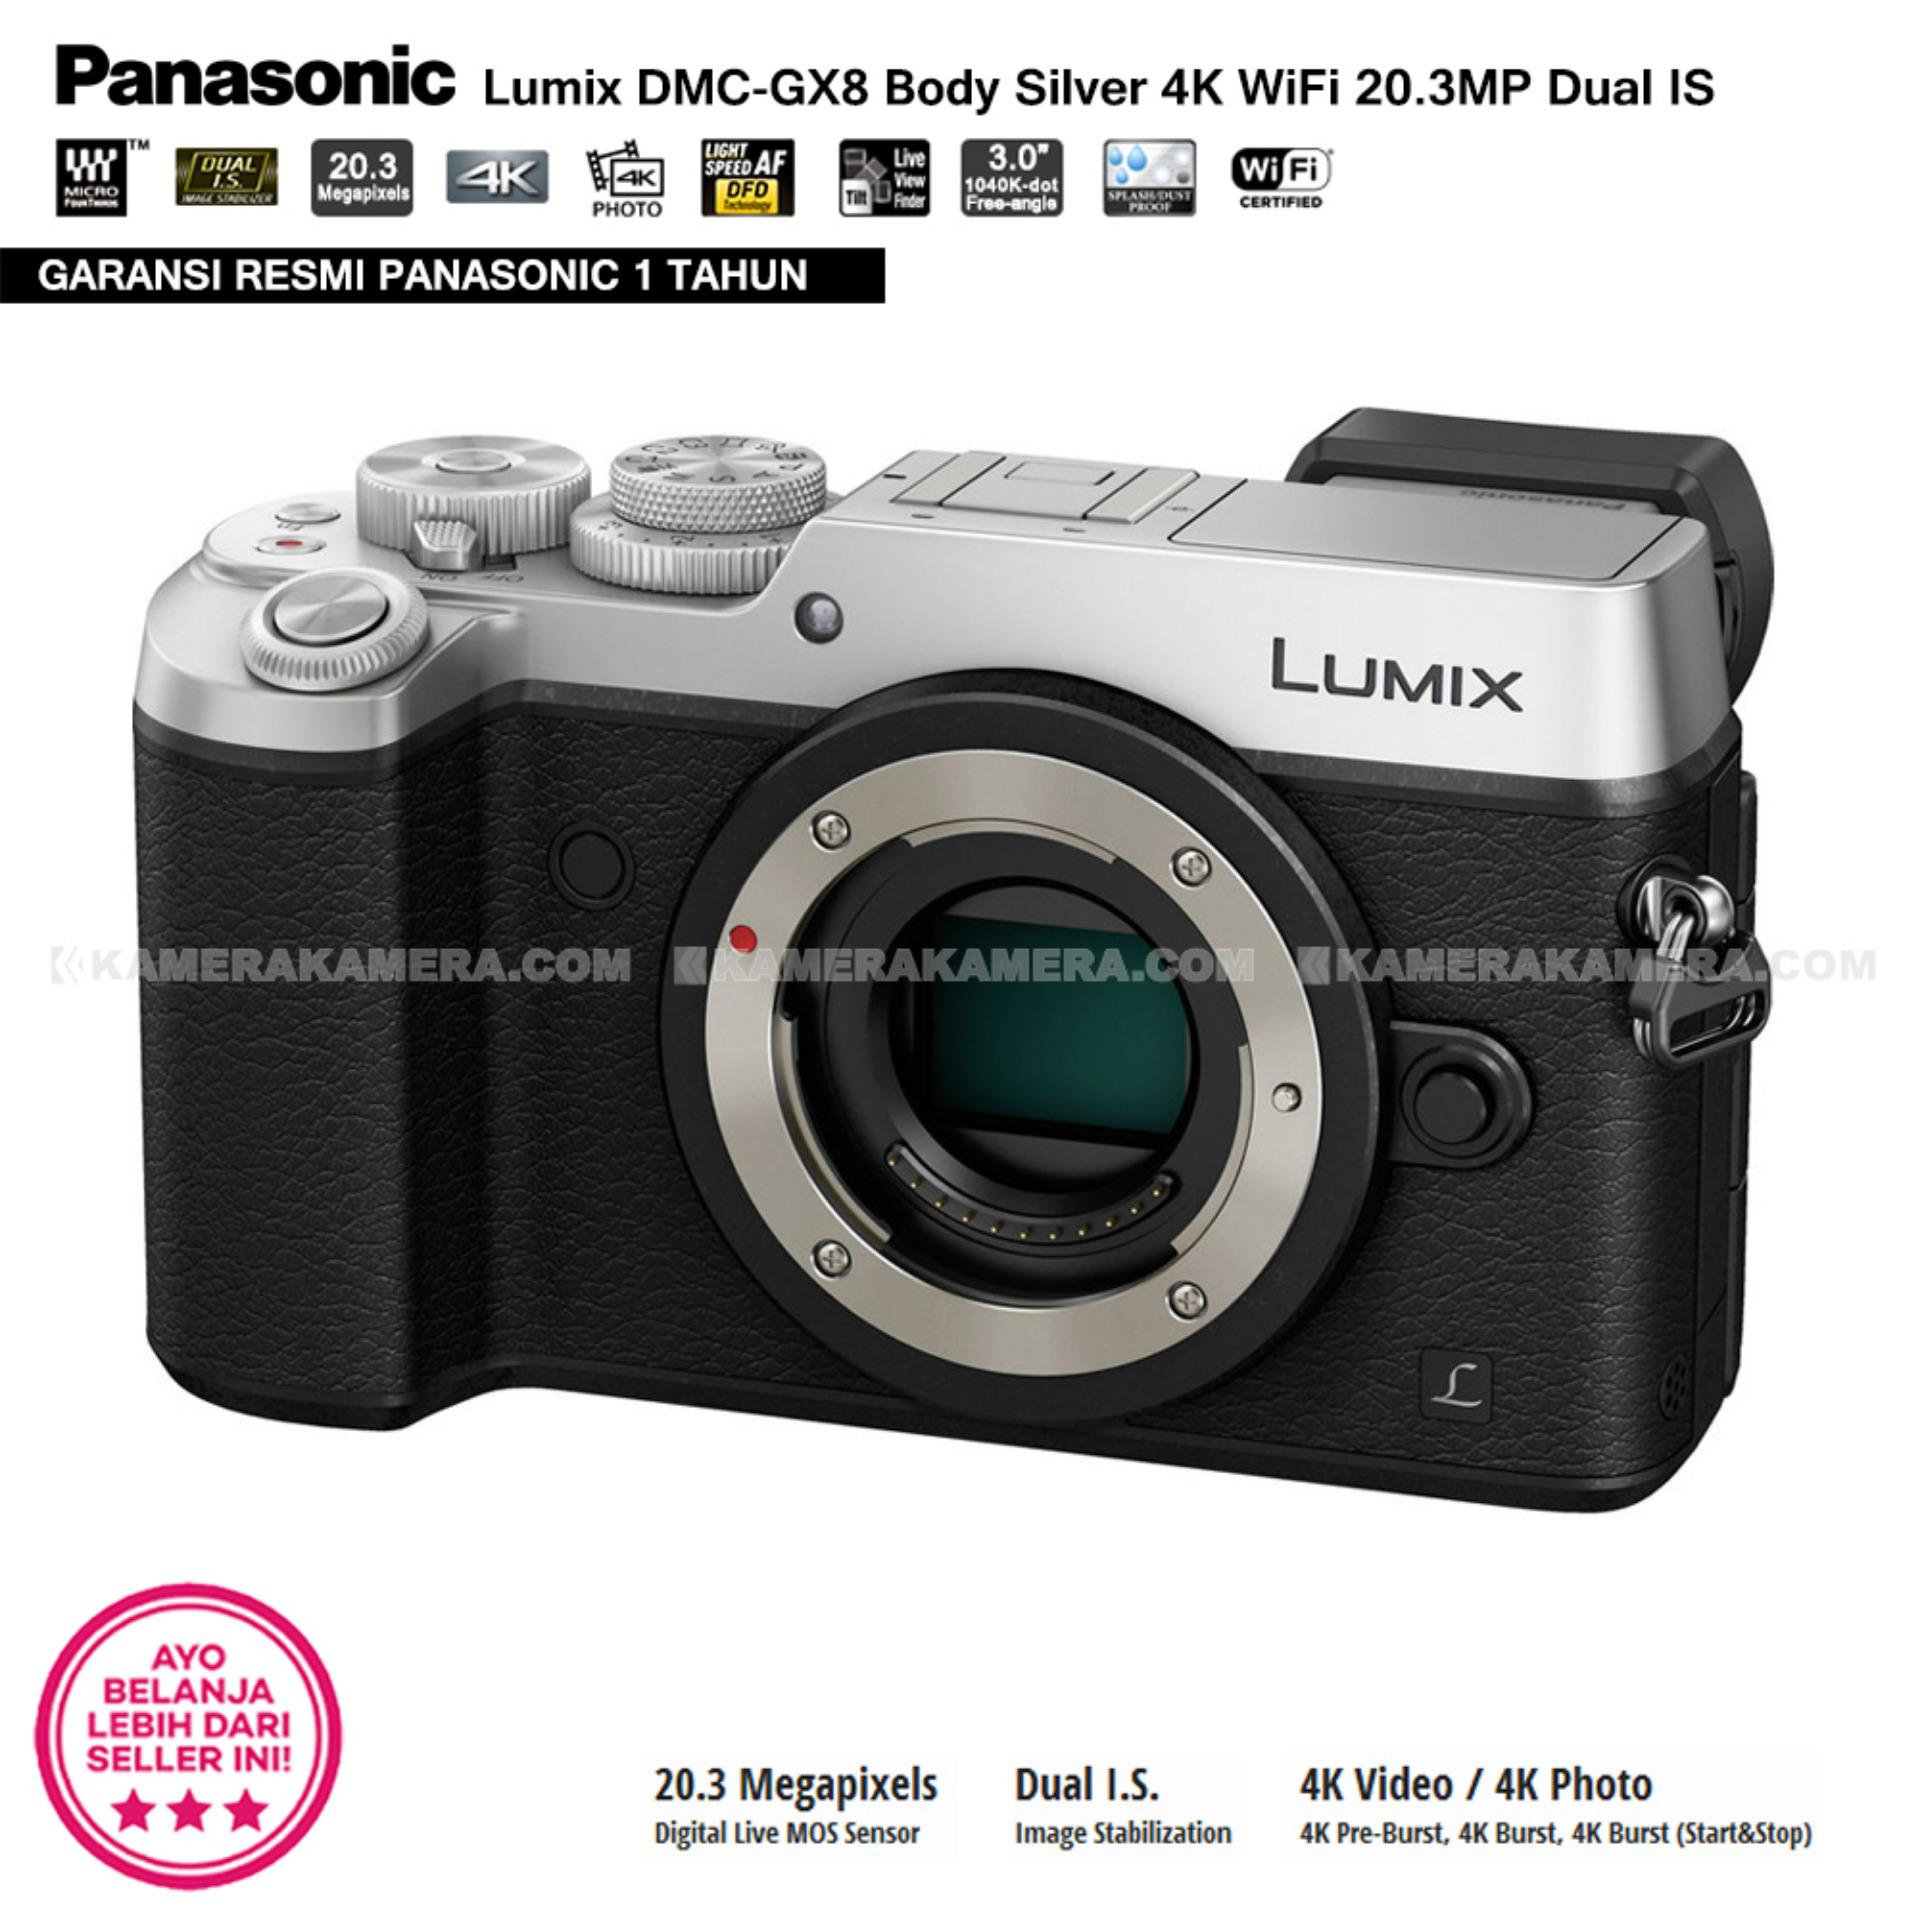 Beli Panasonic Lumix Dmc Gx8 Body Silver 4k Wifi 203mp Dual Is Dc Gf9 Kit G Vario 12 32mm F 35 56 Orange Garansi Resmi